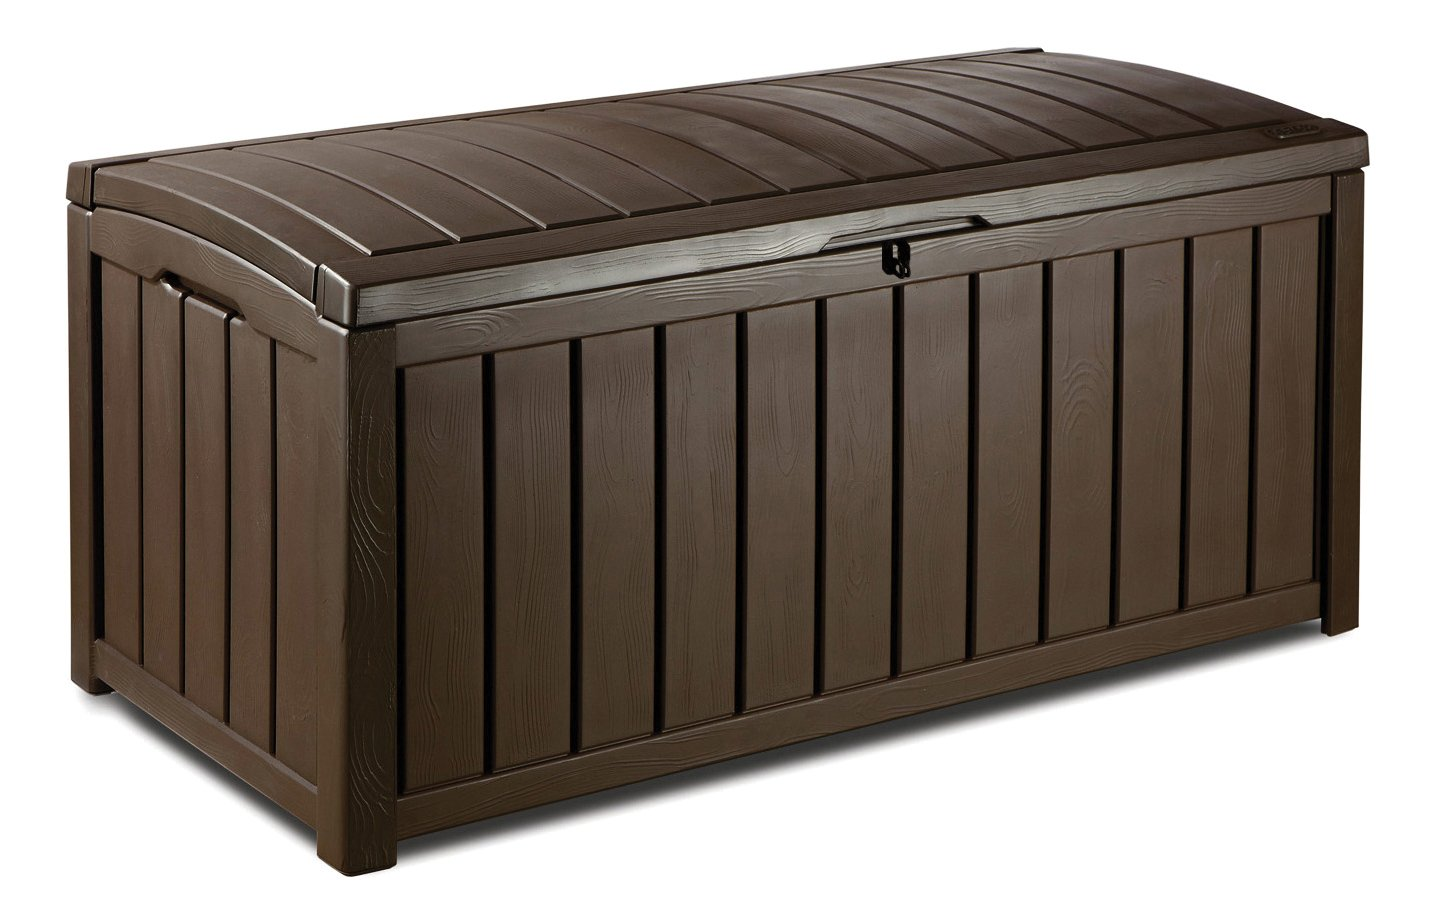 Keter Glenwood Garden Storage Waterproof Box